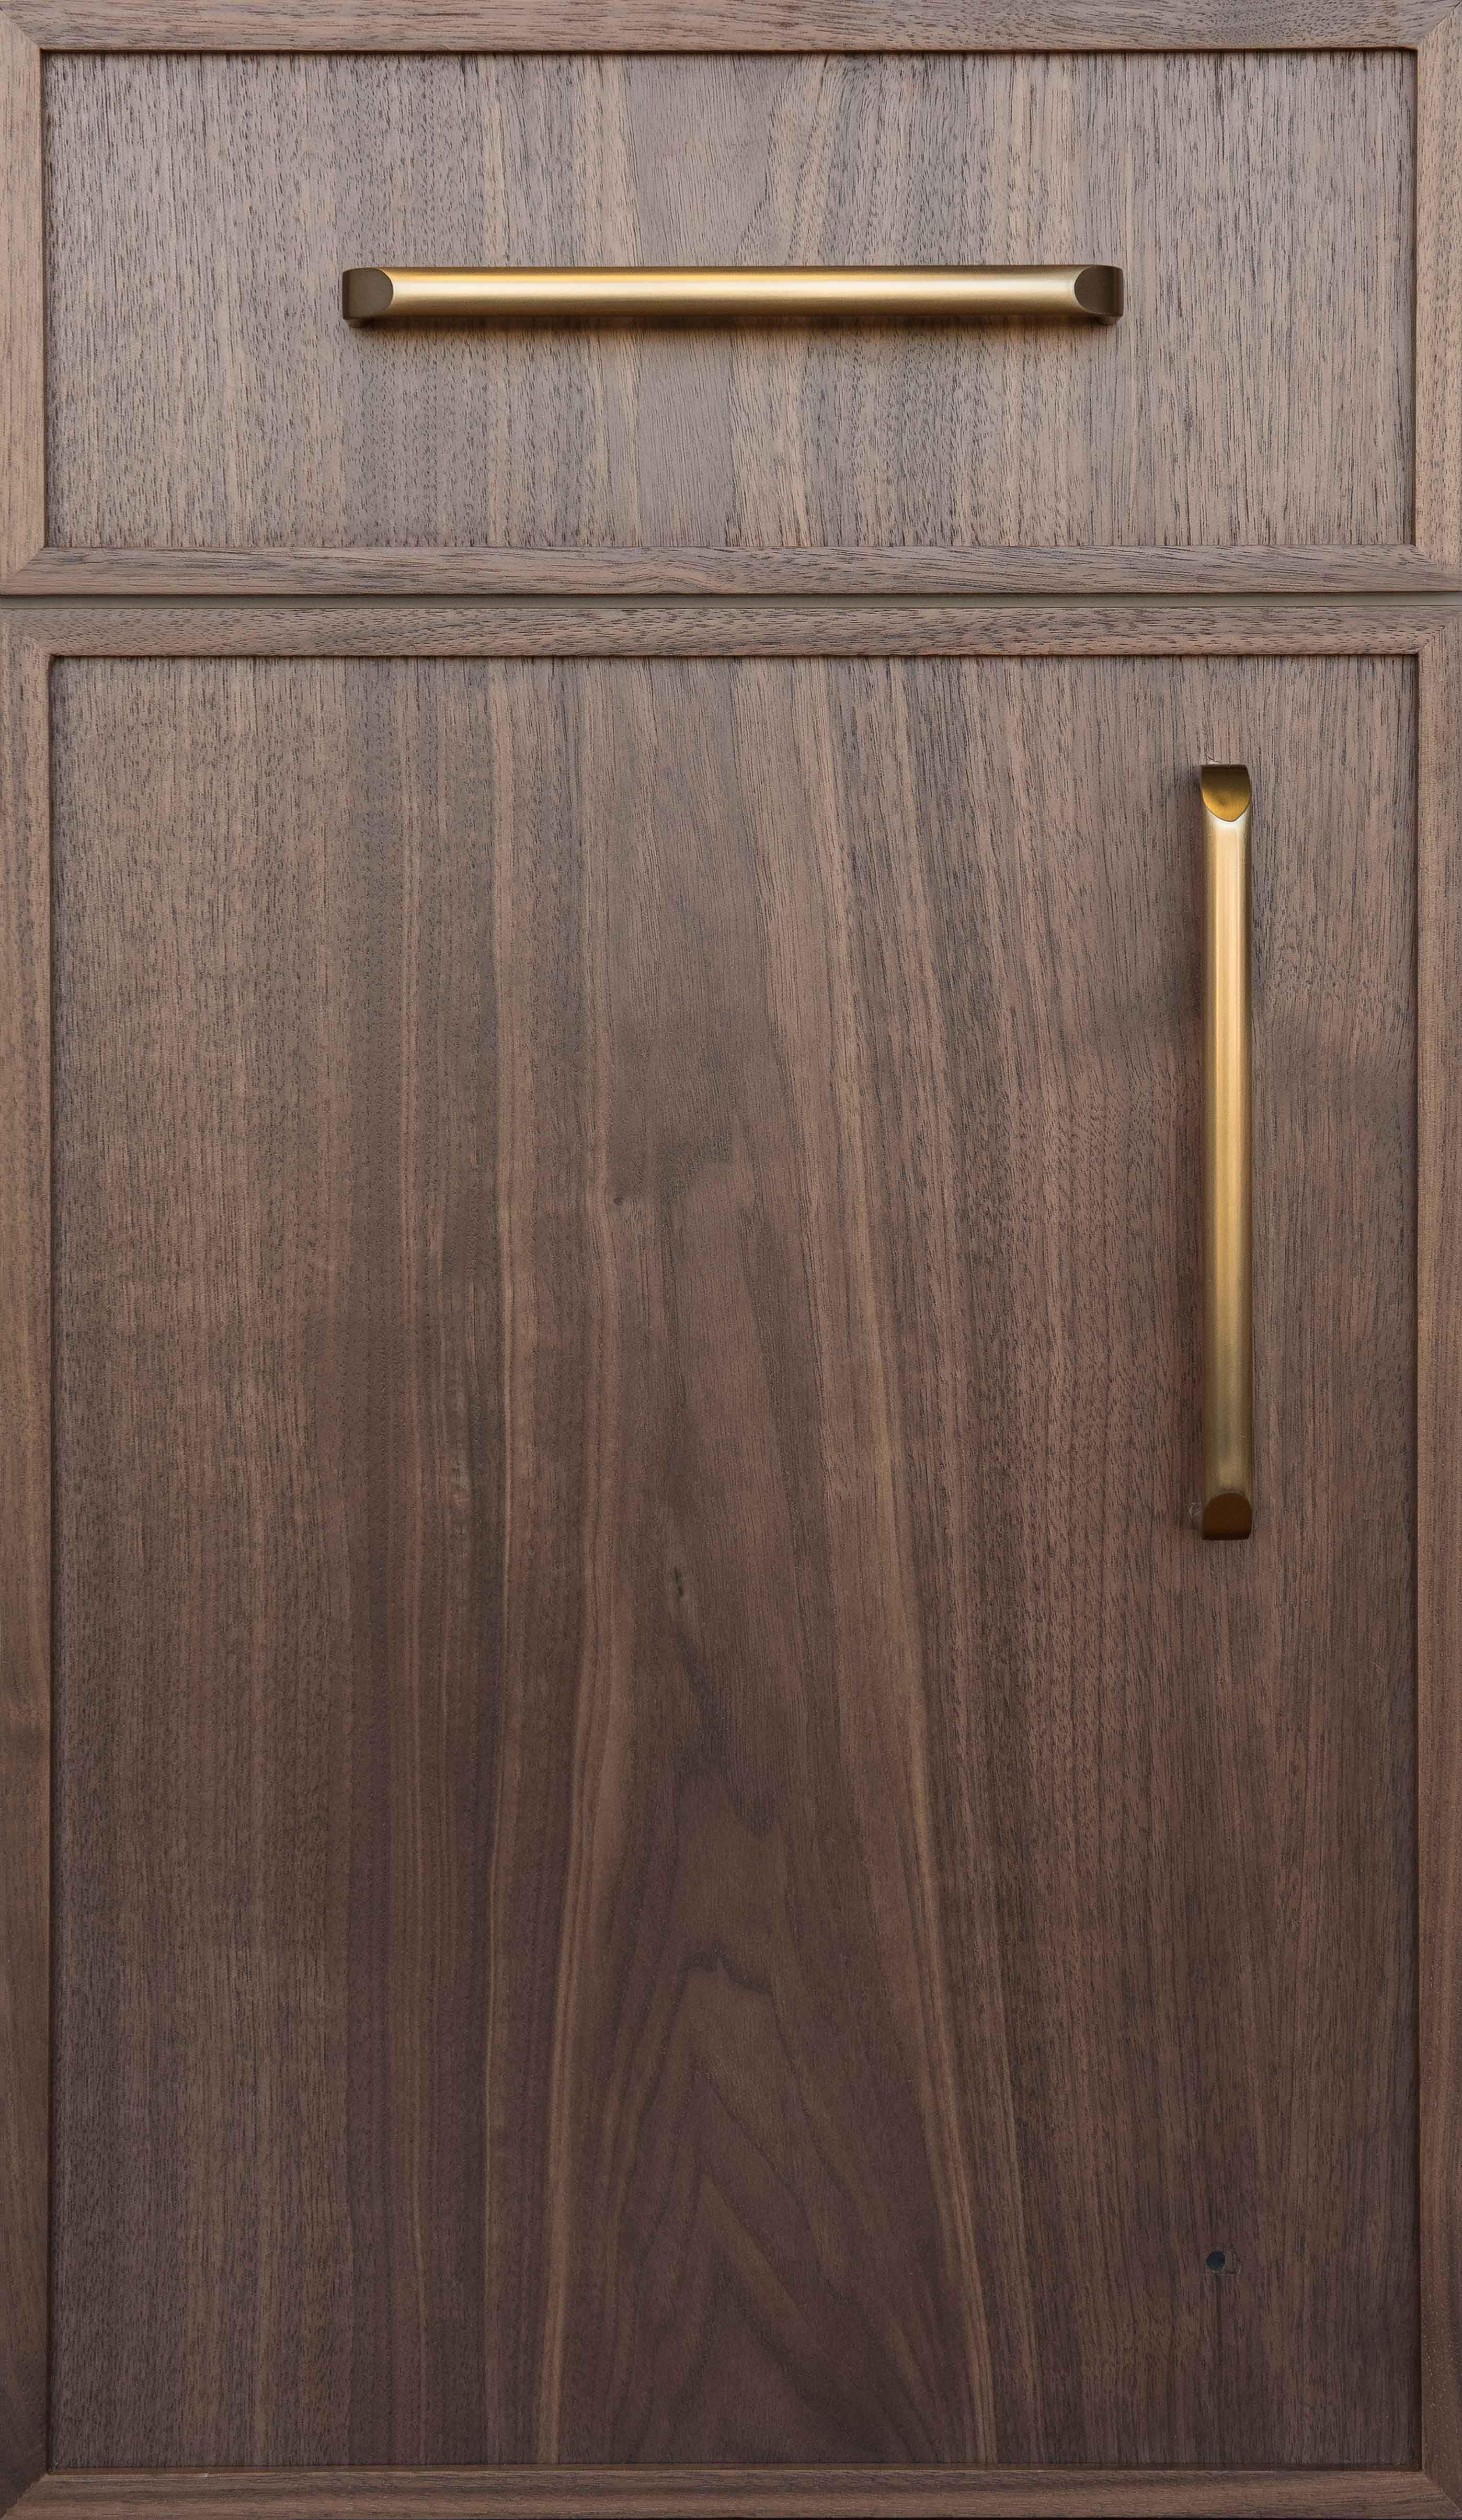 Inset Kitchen Cabinets Vs Overlay Kitchen Cabinet Styles Kitchen Cabinets Kitchen Cabinet Door Styles